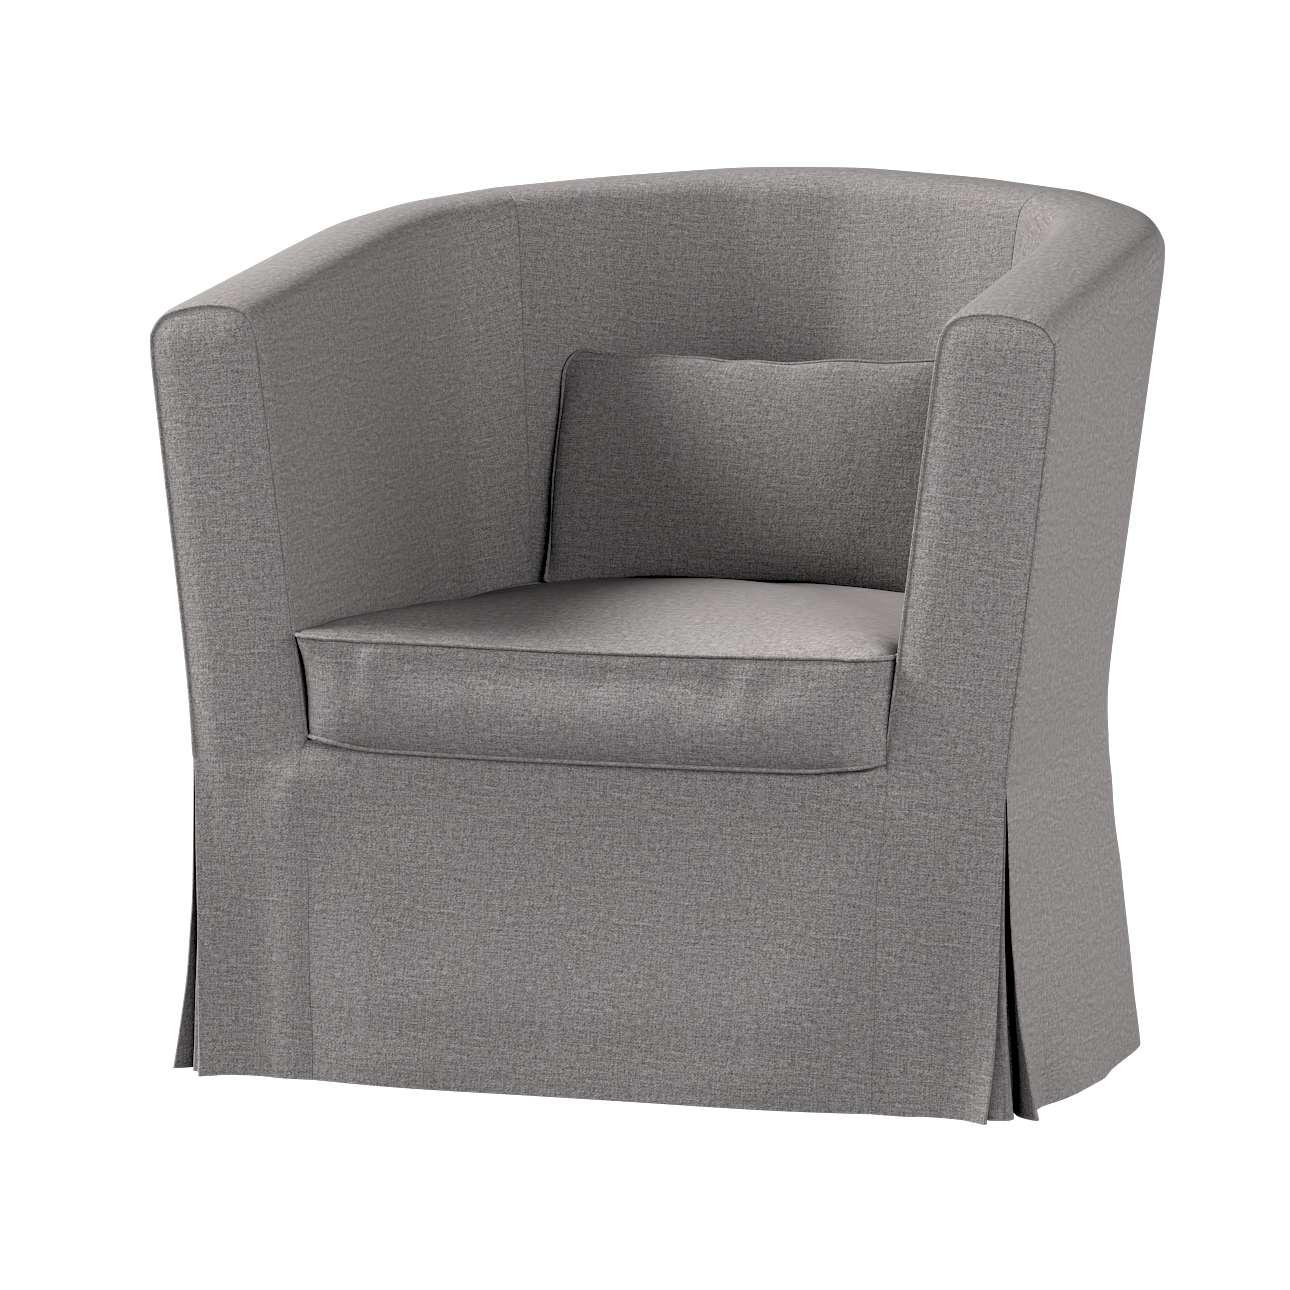 Pokrowiec na fotel Ektorp Tullsta fotel Ektorp Tullsta w kolekcji Edinburgh, tkanina: 115-81